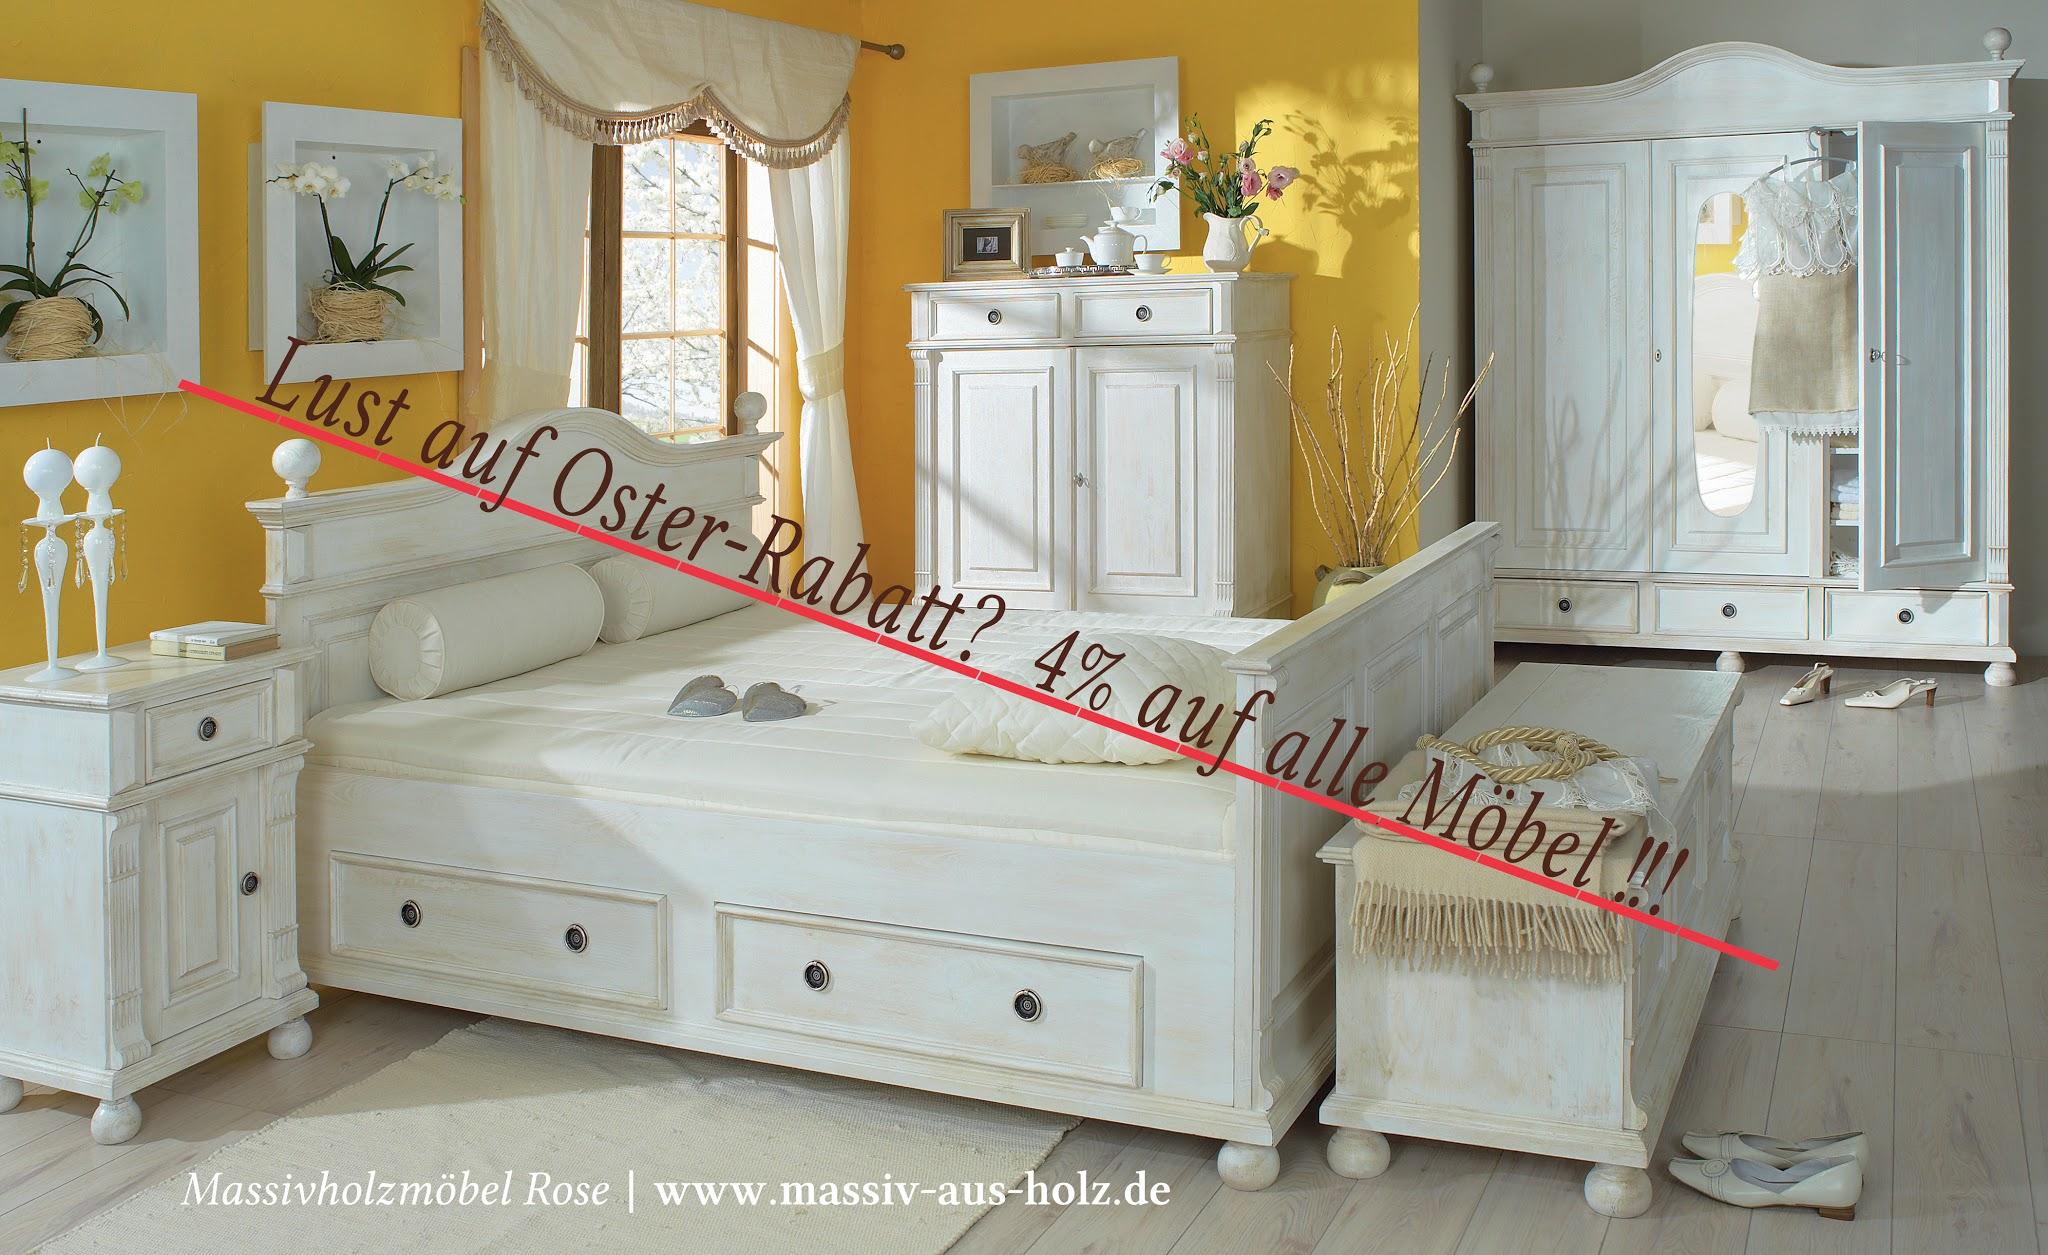 Schlafzimmer Cremefarben Emejing Schlafzimmer Cremefarben Images ...